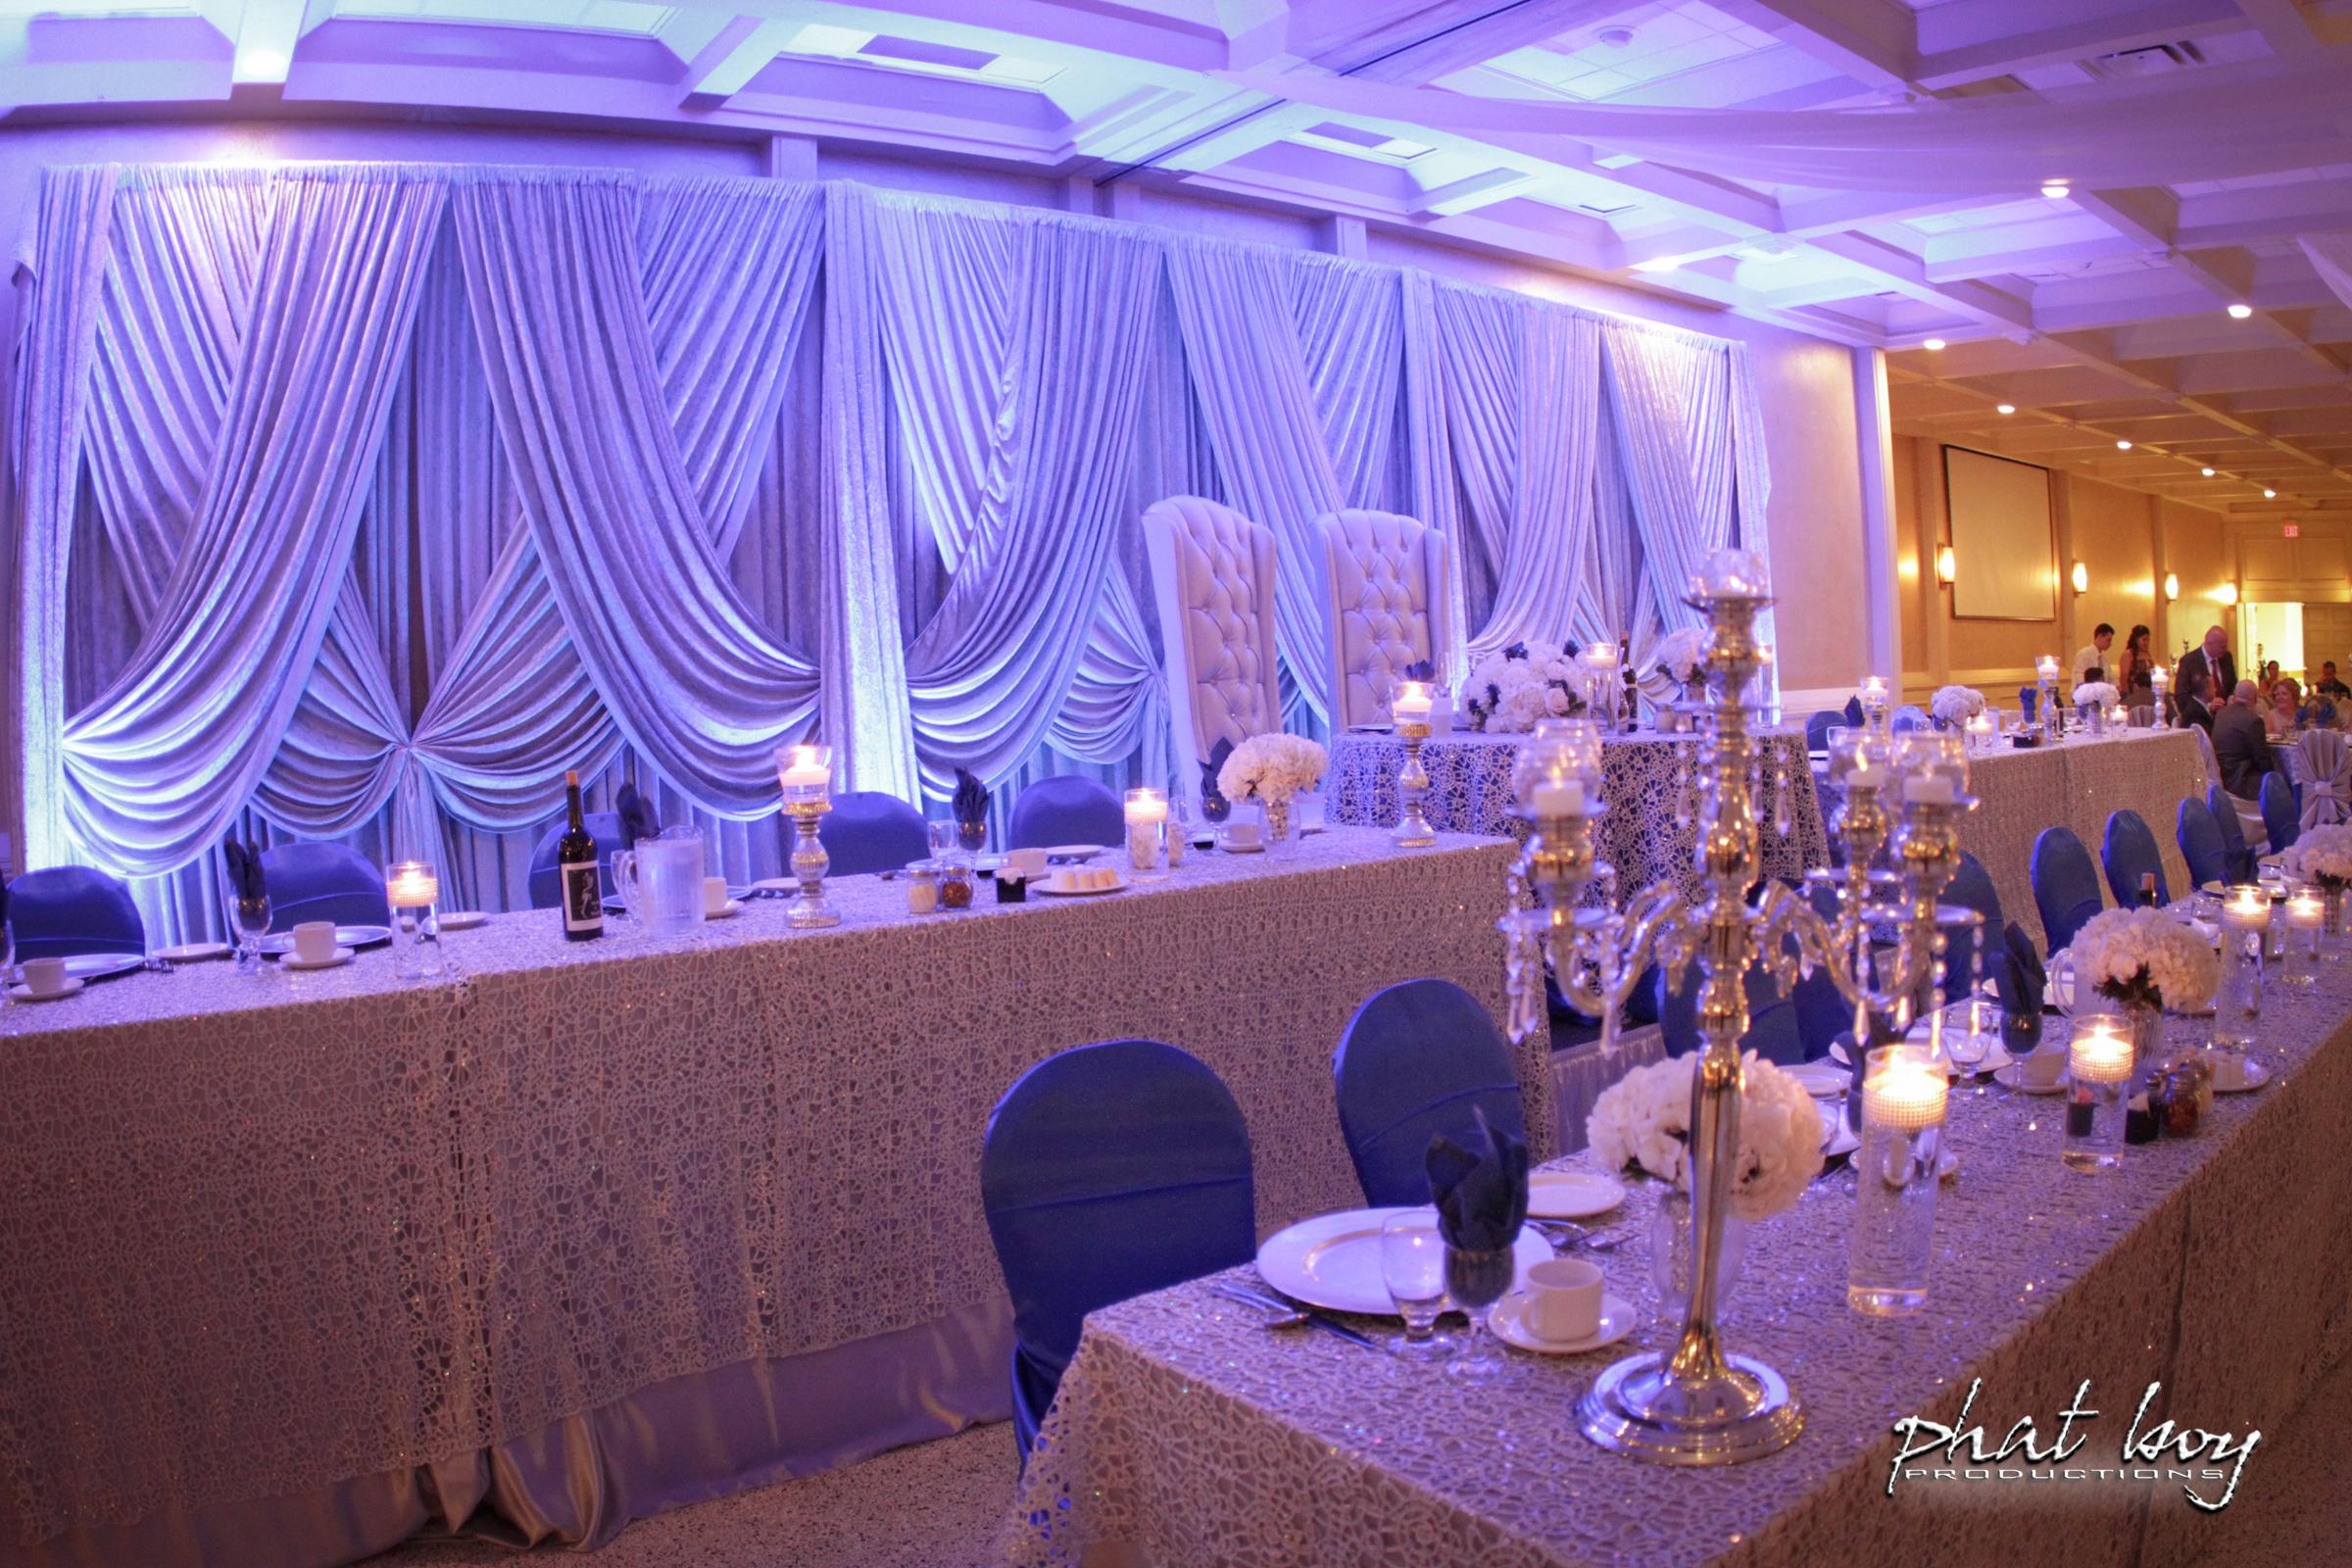 Nina__Andre_-_Wedding_Decor-2.jpg